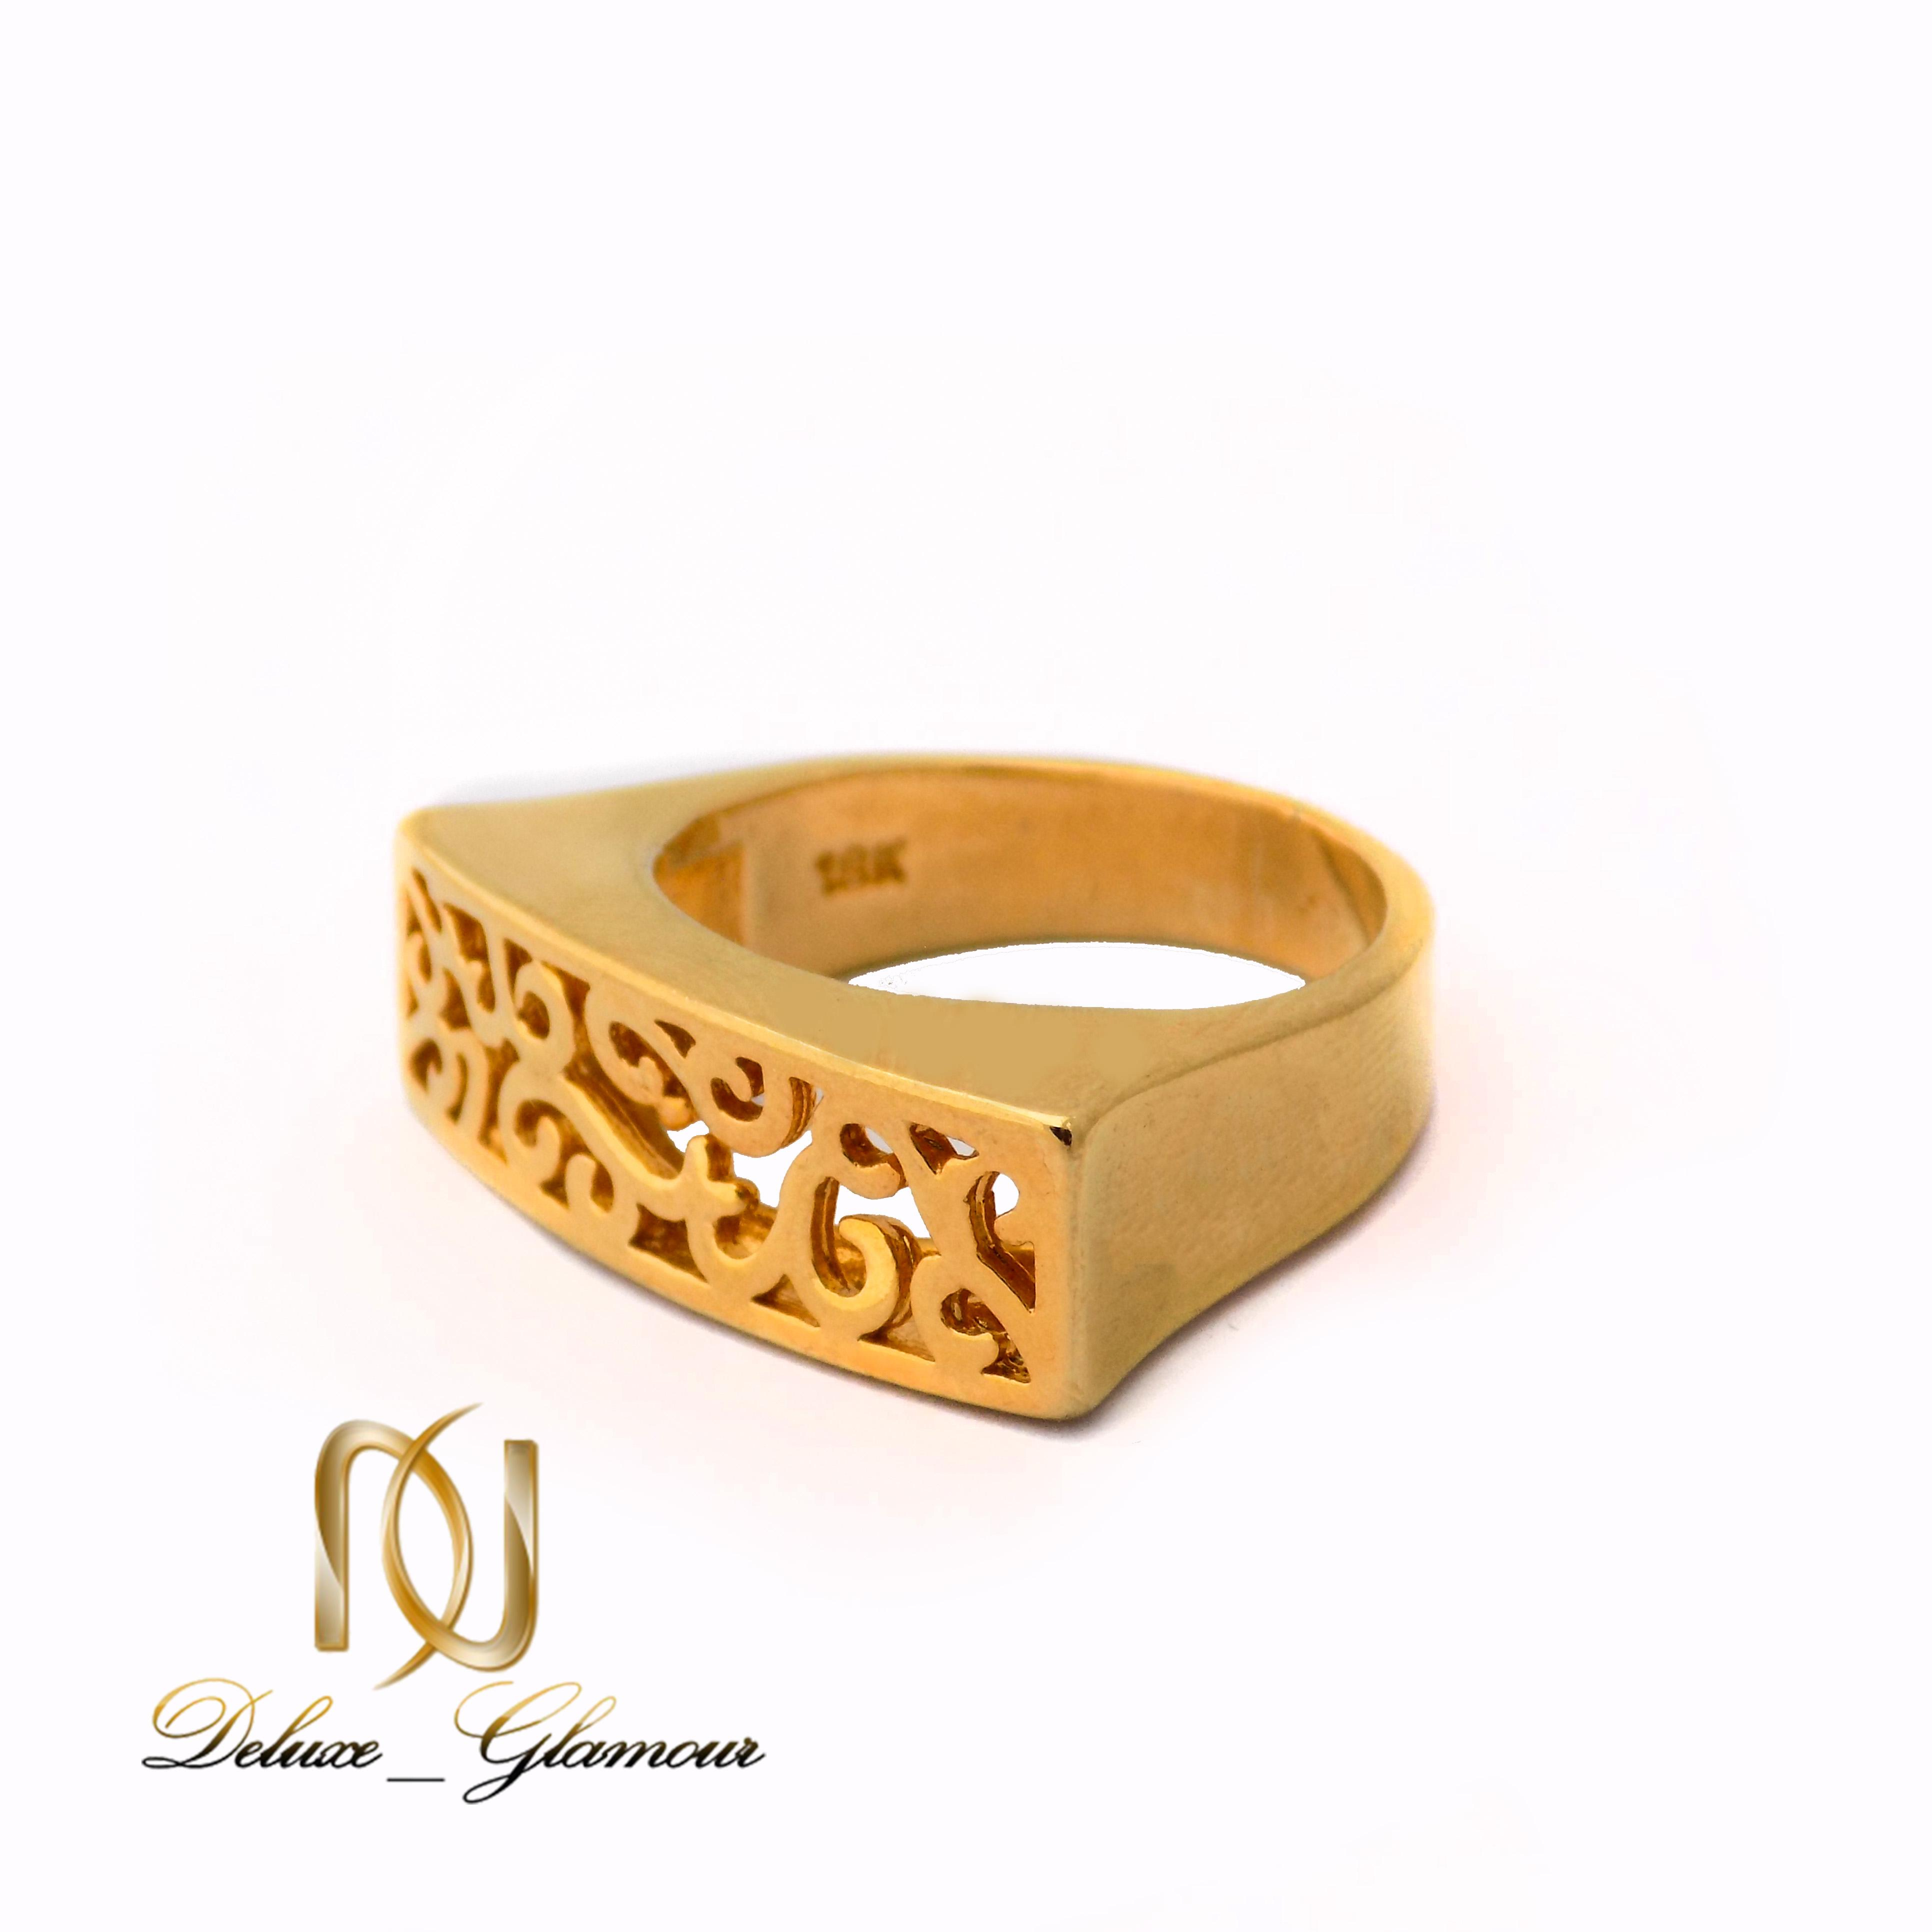 انگشتر زنانه برنجی طرح طلا توری مستطیلی rg-n368